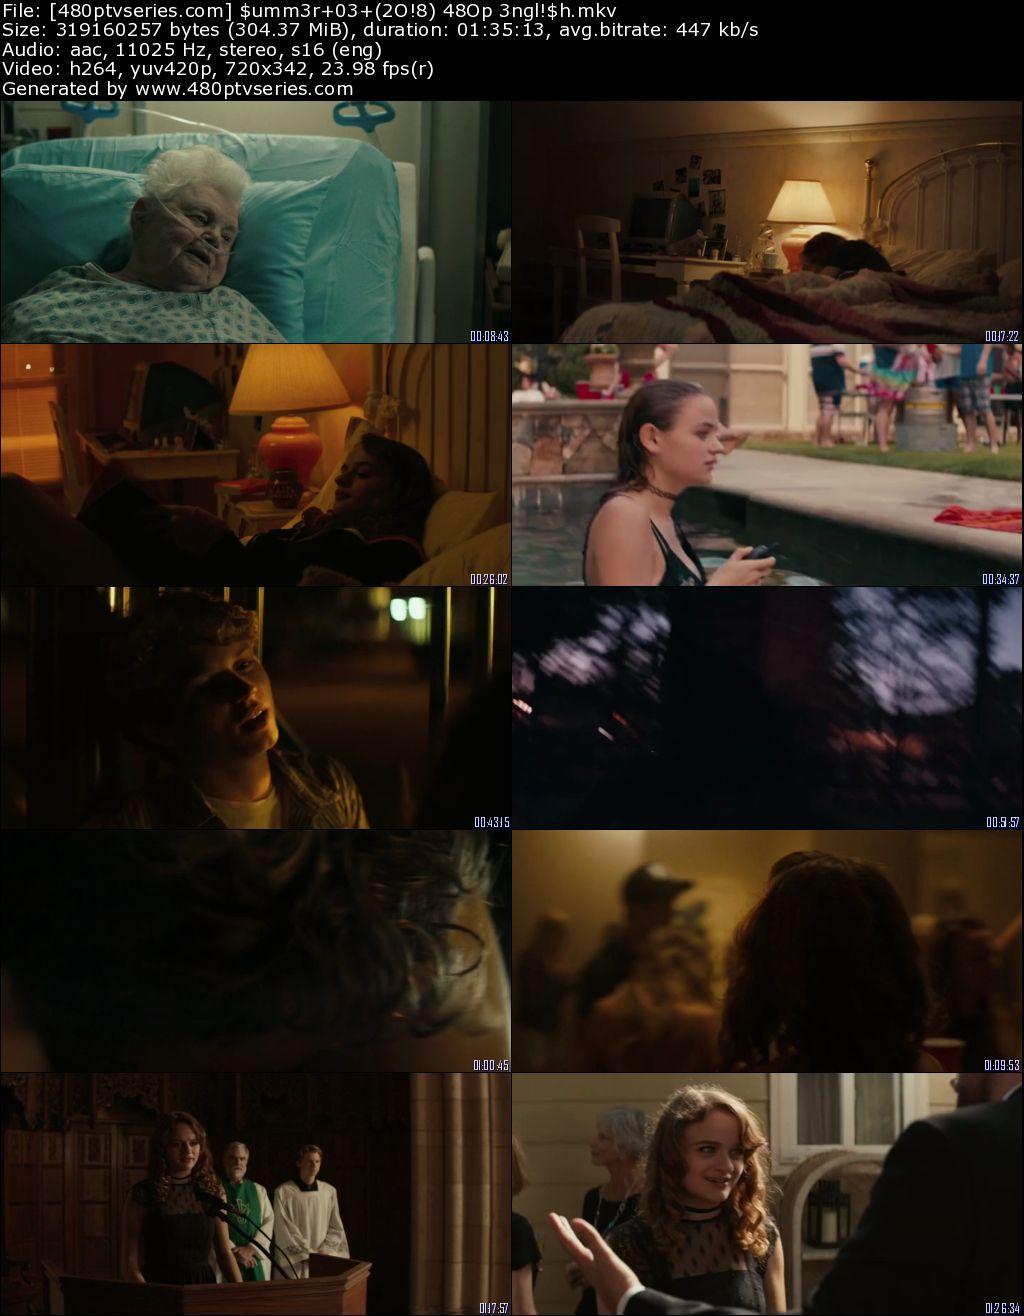 Summer 03 (2018) 300MB Full English Movie Download 480p Web-DL Free Watch Online Full Movie Download Worldfree4u 9xmovies